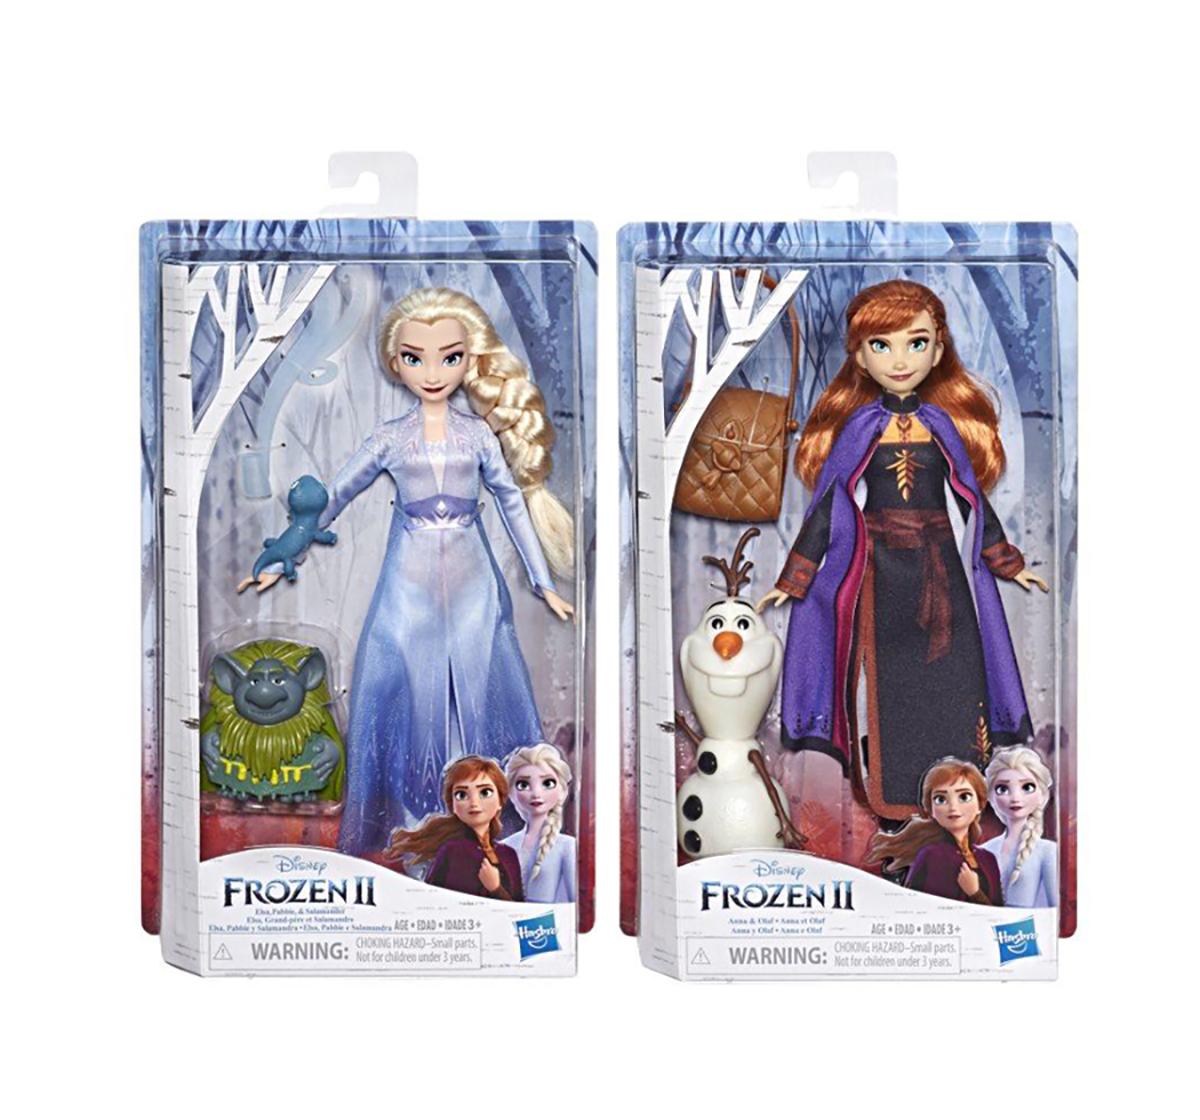 Disney | Disney Frozen 2 Storytelling Fashion Doll Assorted Dolls & Accessories for Girls age 3Y+